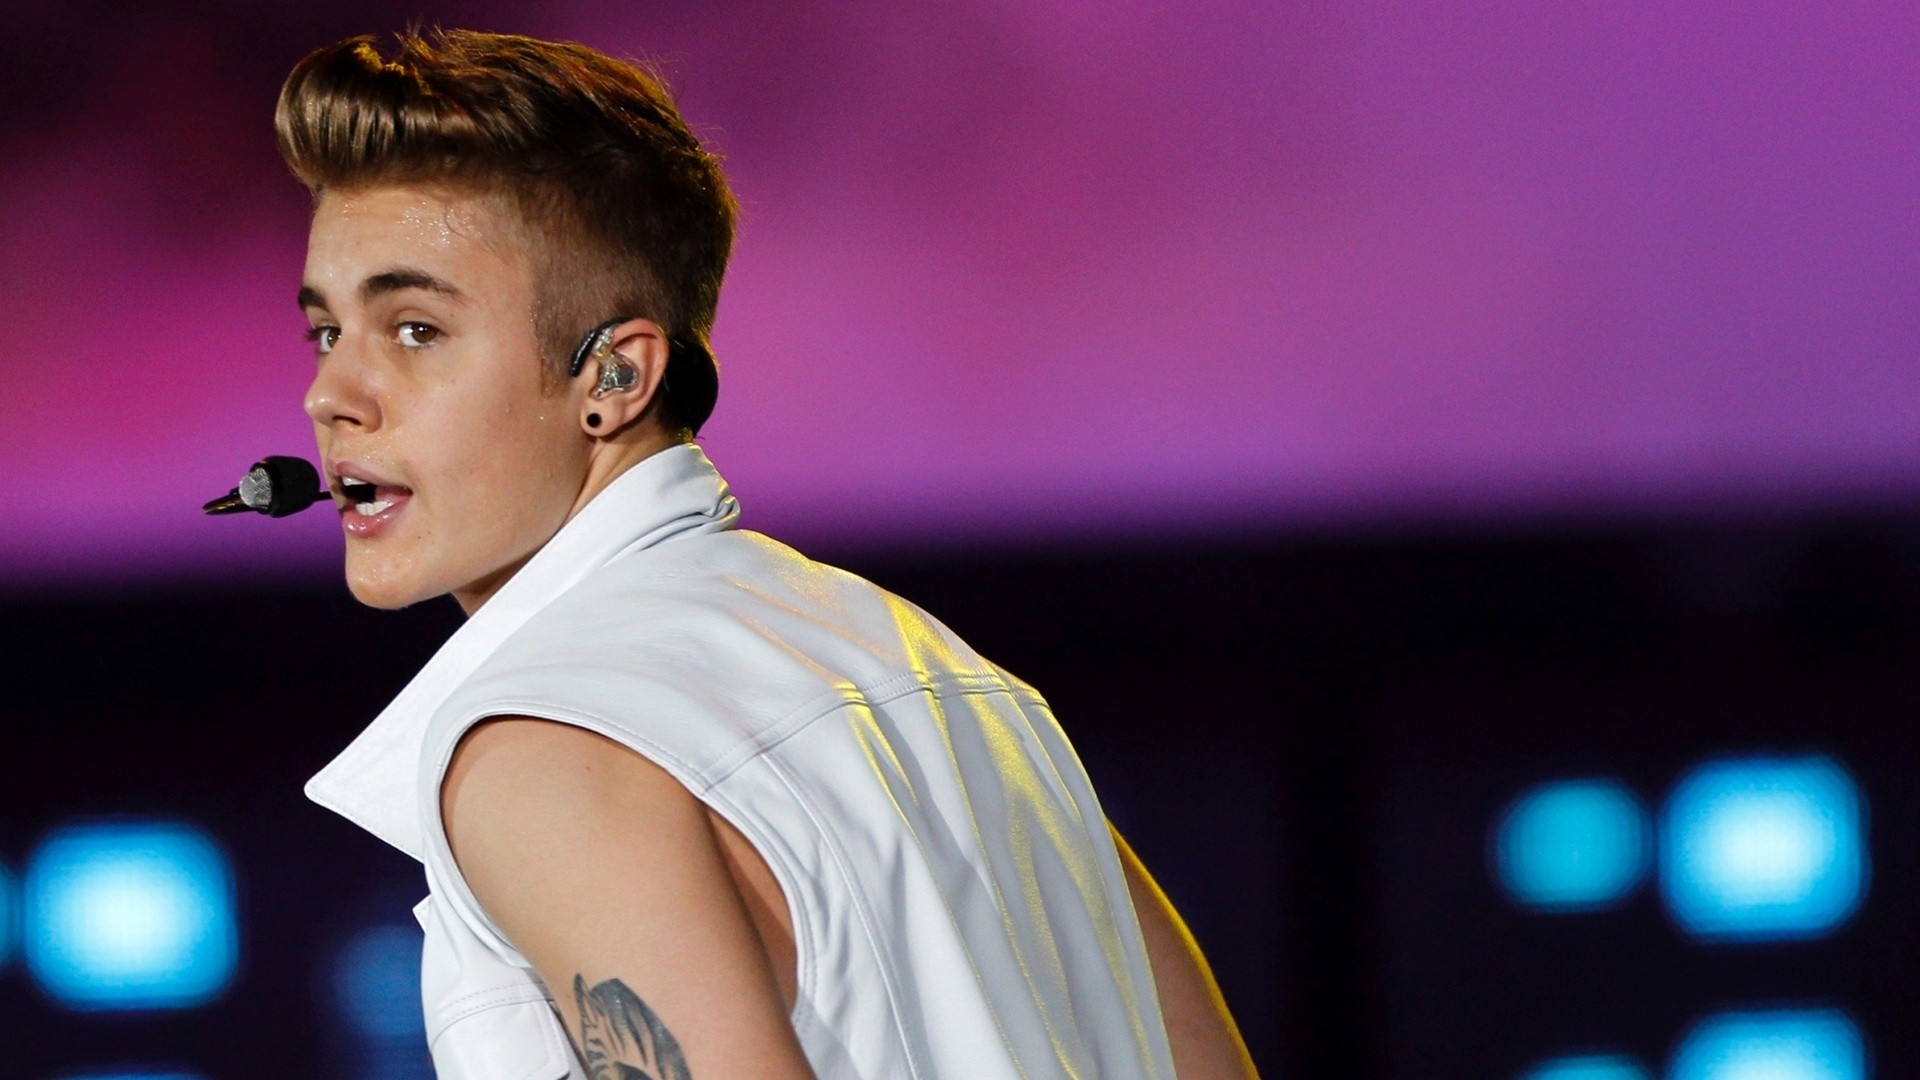 Wallpaper download justin bieber - Justin Bieber Singing Hd Wallpaperwelcome To Starchop